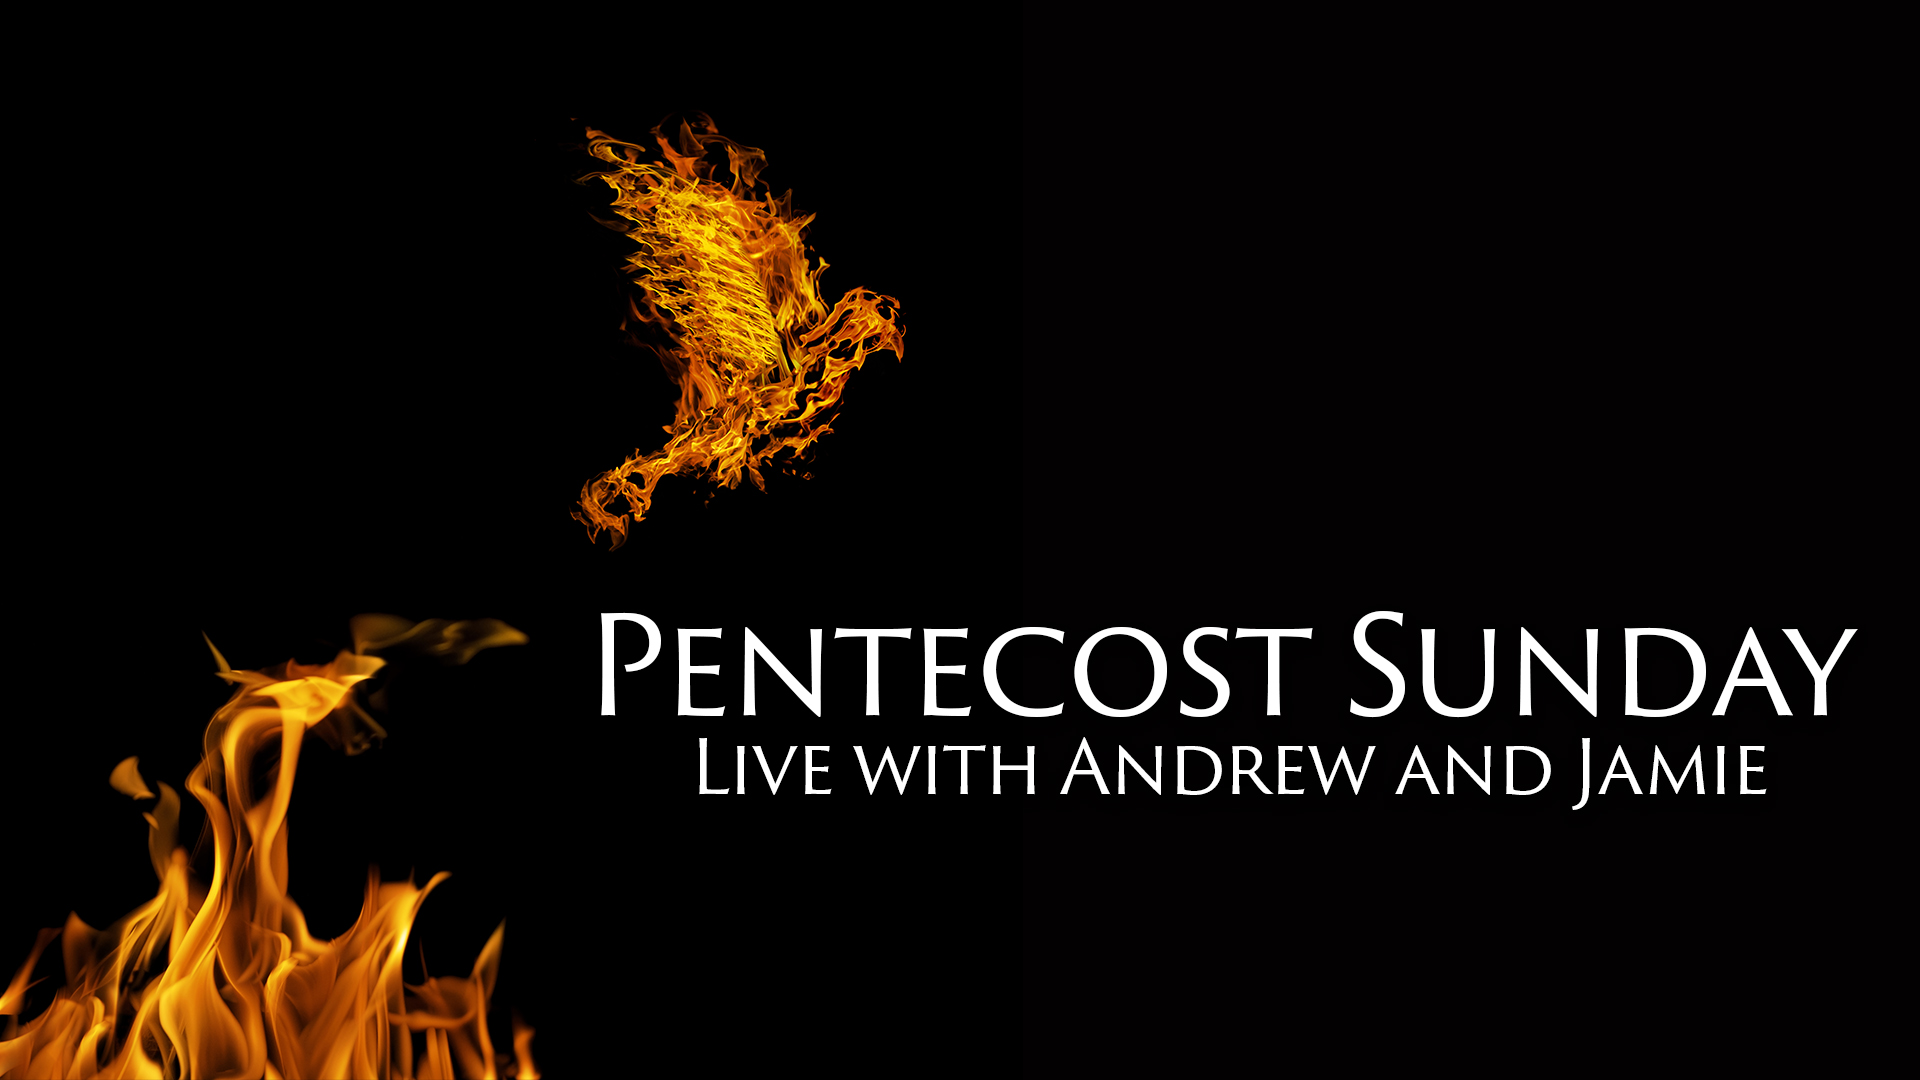 Pentecost Sunday Live Stream